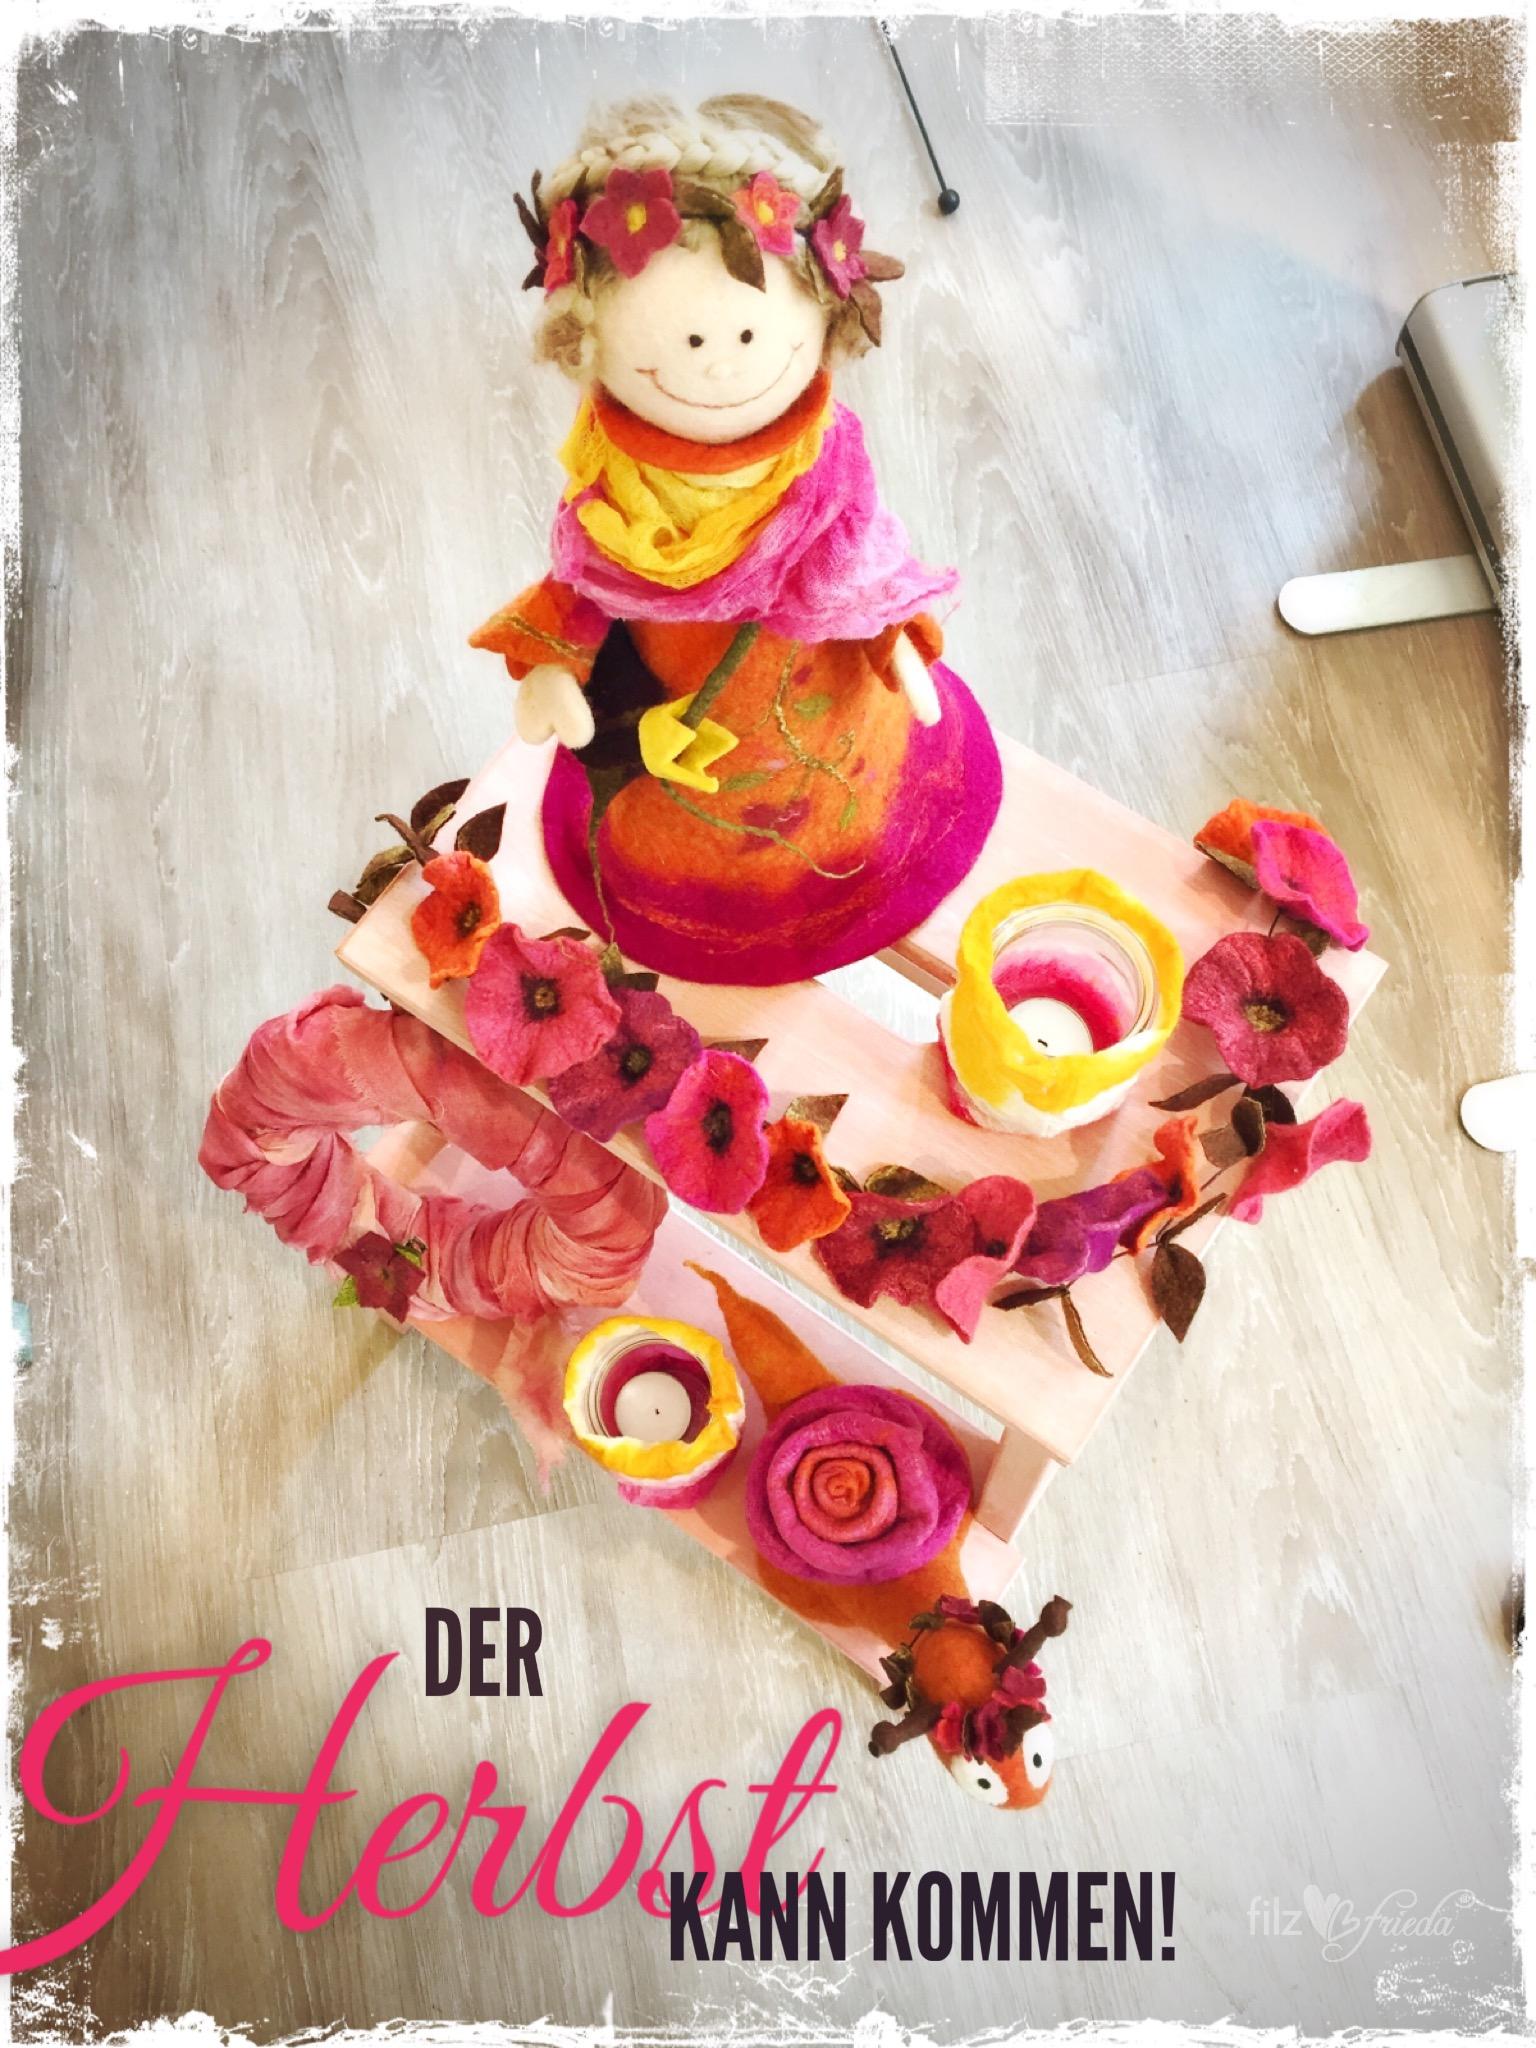 Trari Trara der Herbst ist bald da! Filzen für den Herbst … Plätze frei!